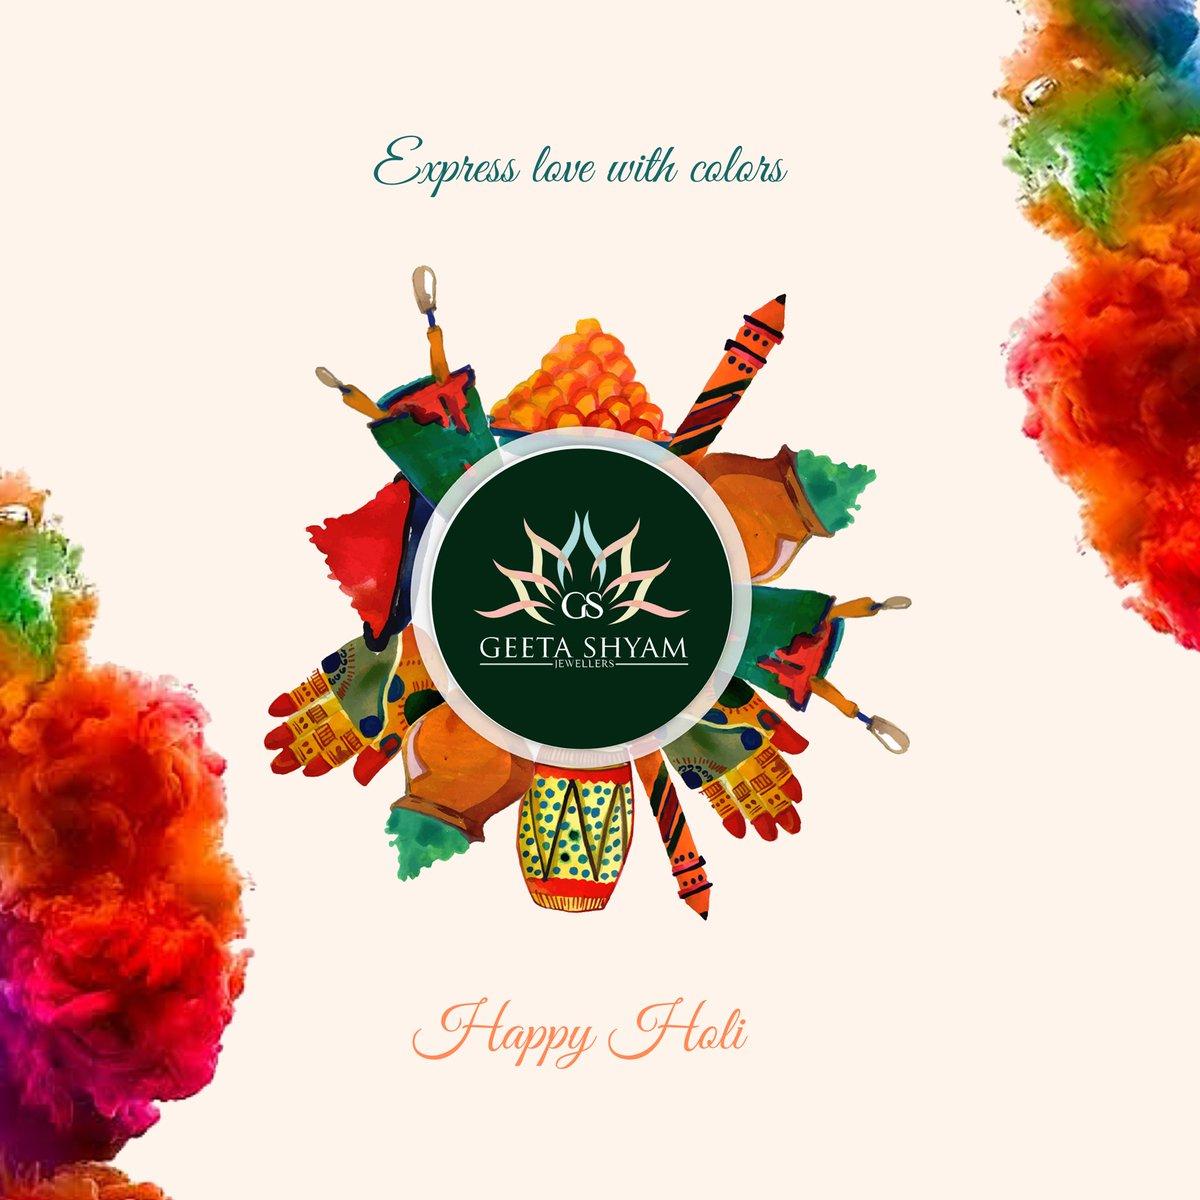 This Holi Express love with colors!!  Happy Holi! #GeetaShyamJewellers  . . #HappyHoli #Holi2020 #JadauJewellery #Jadau #HeritageJewellery #Holi #FestiveVibes #festival #Jaipur #Jewellery #Jewels #InstaHoli #HoliVibes #CelebrateHolipic.twitter.com/gF7iziiyyy